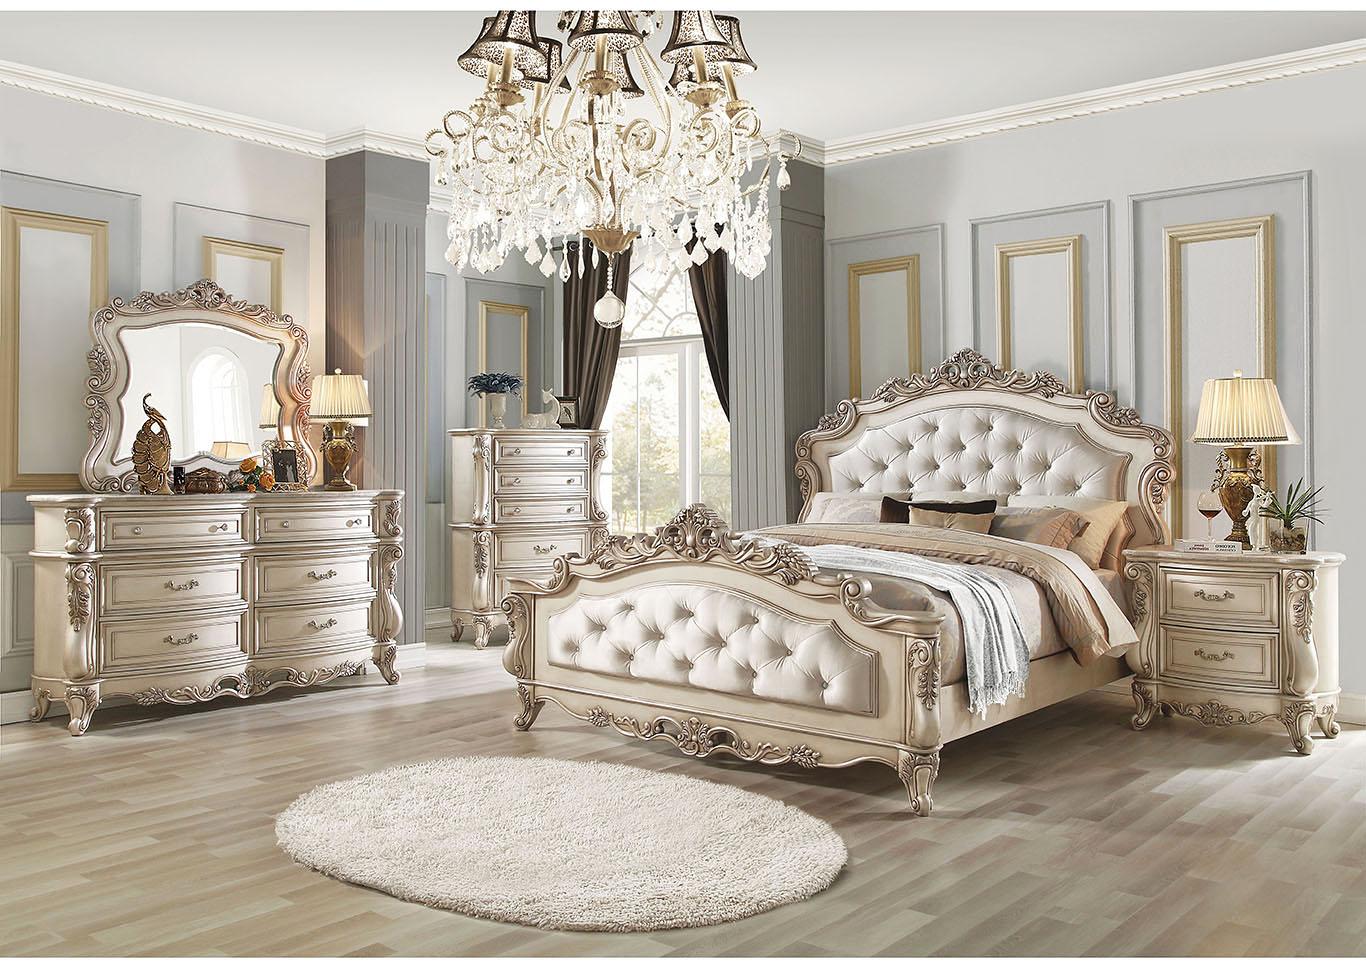 Just Furniture Gorsedd Antique White California King Bed